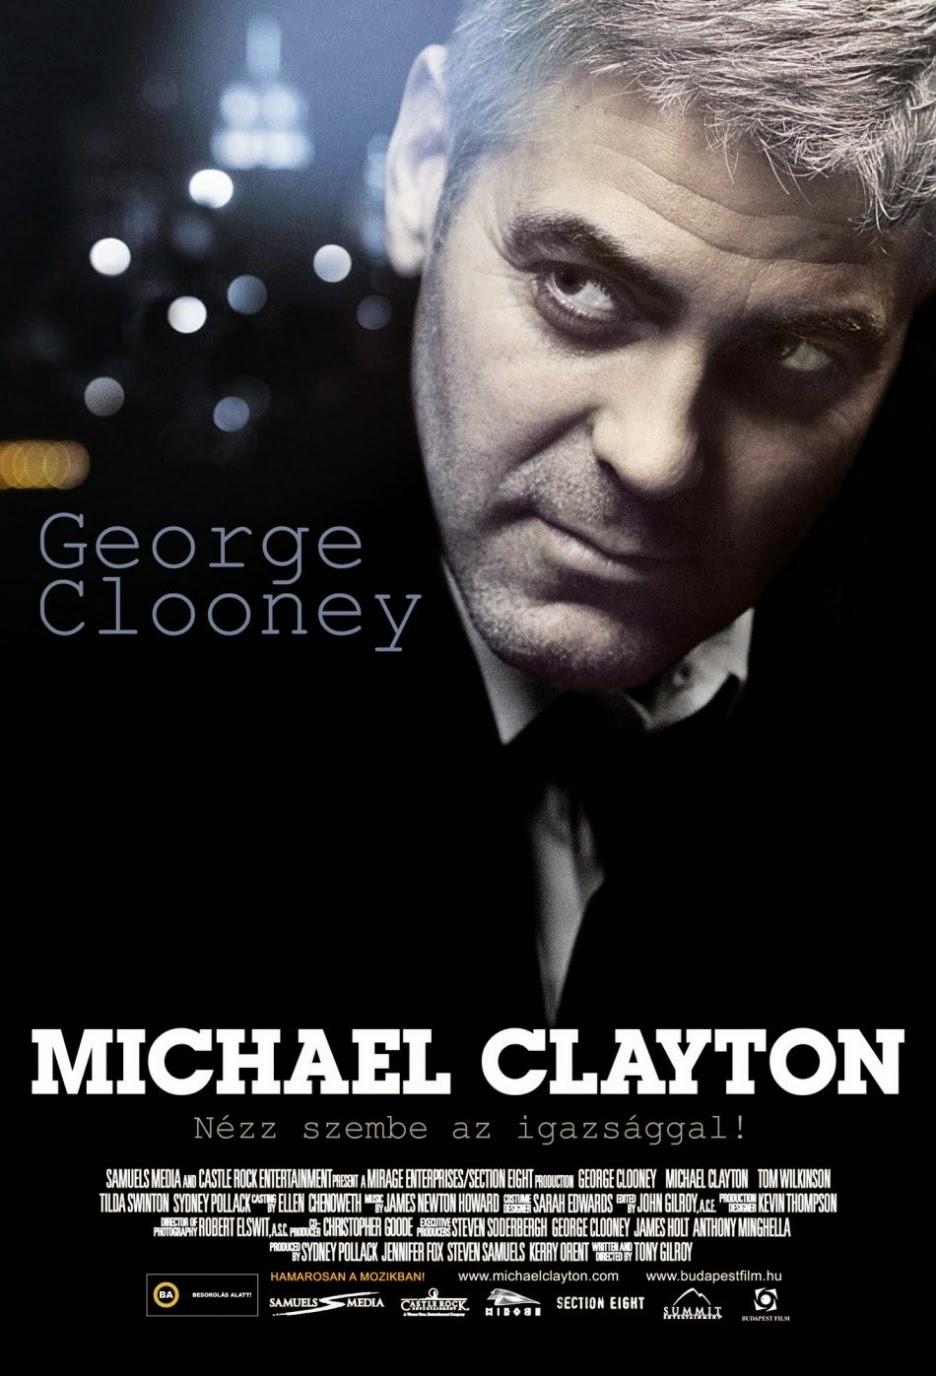 Michael Clayton Net Worth